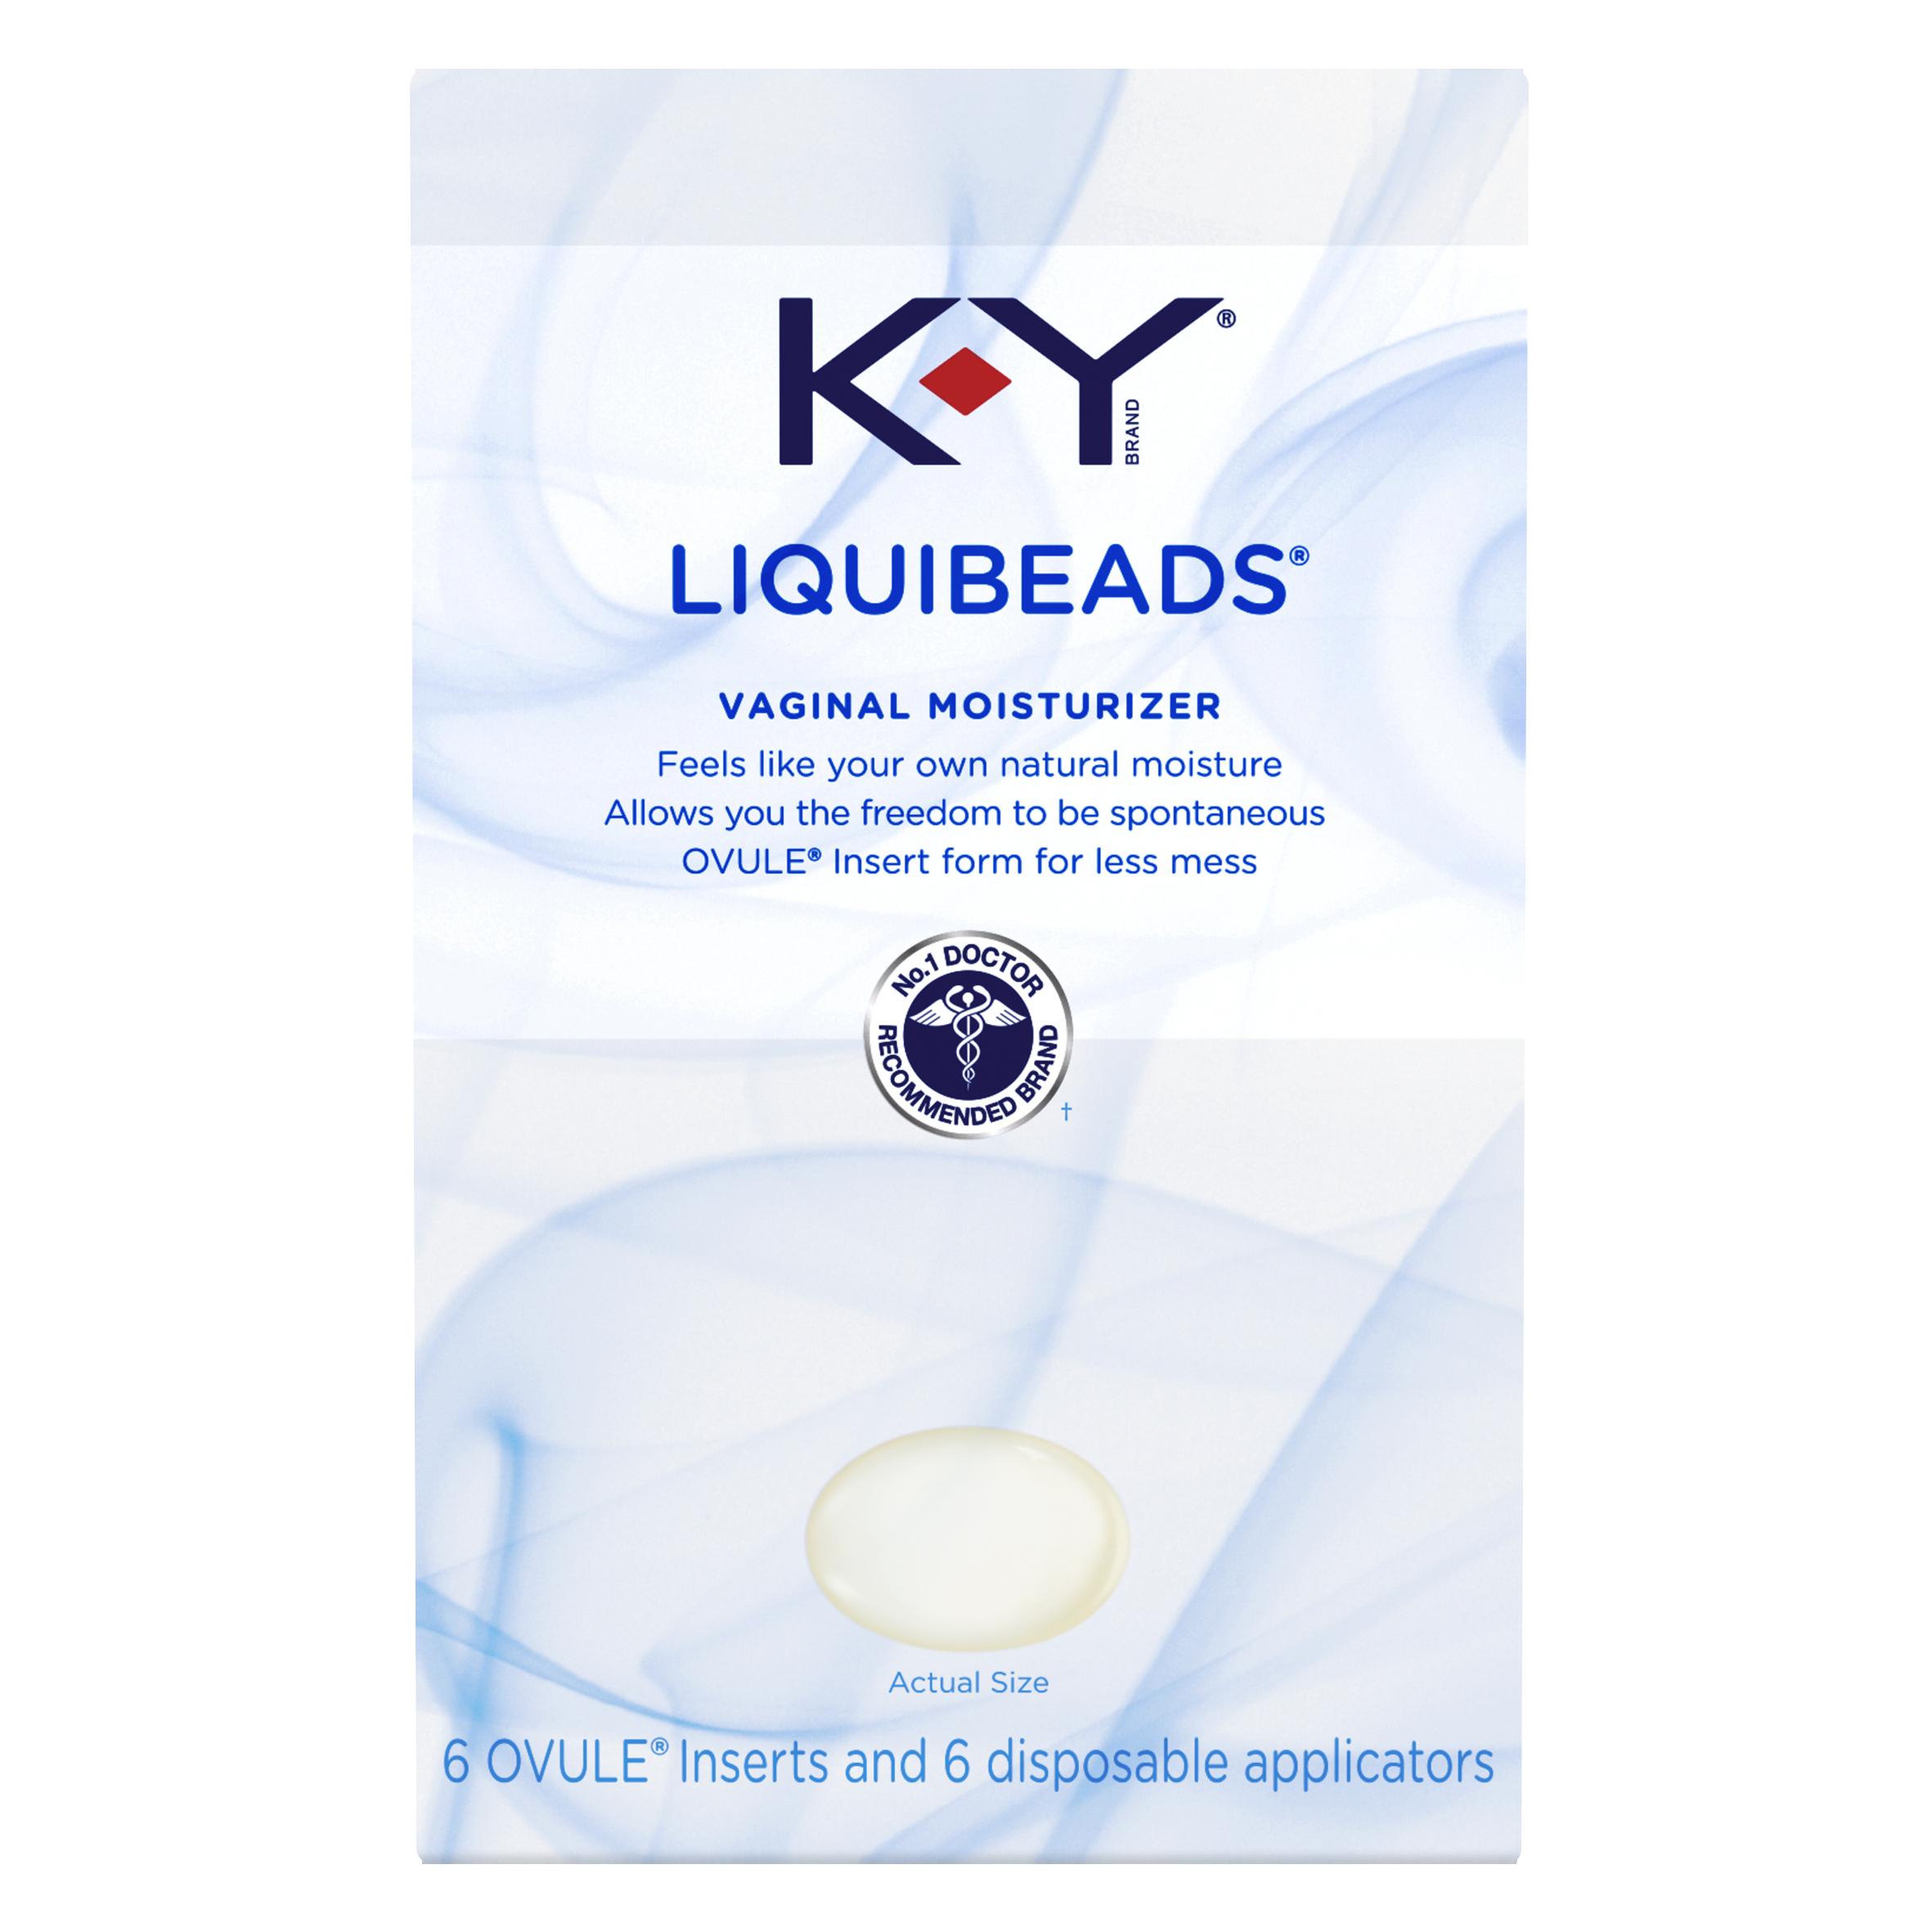 K-Y Liquibeads Vaginal Moisturizer, 6 Beads